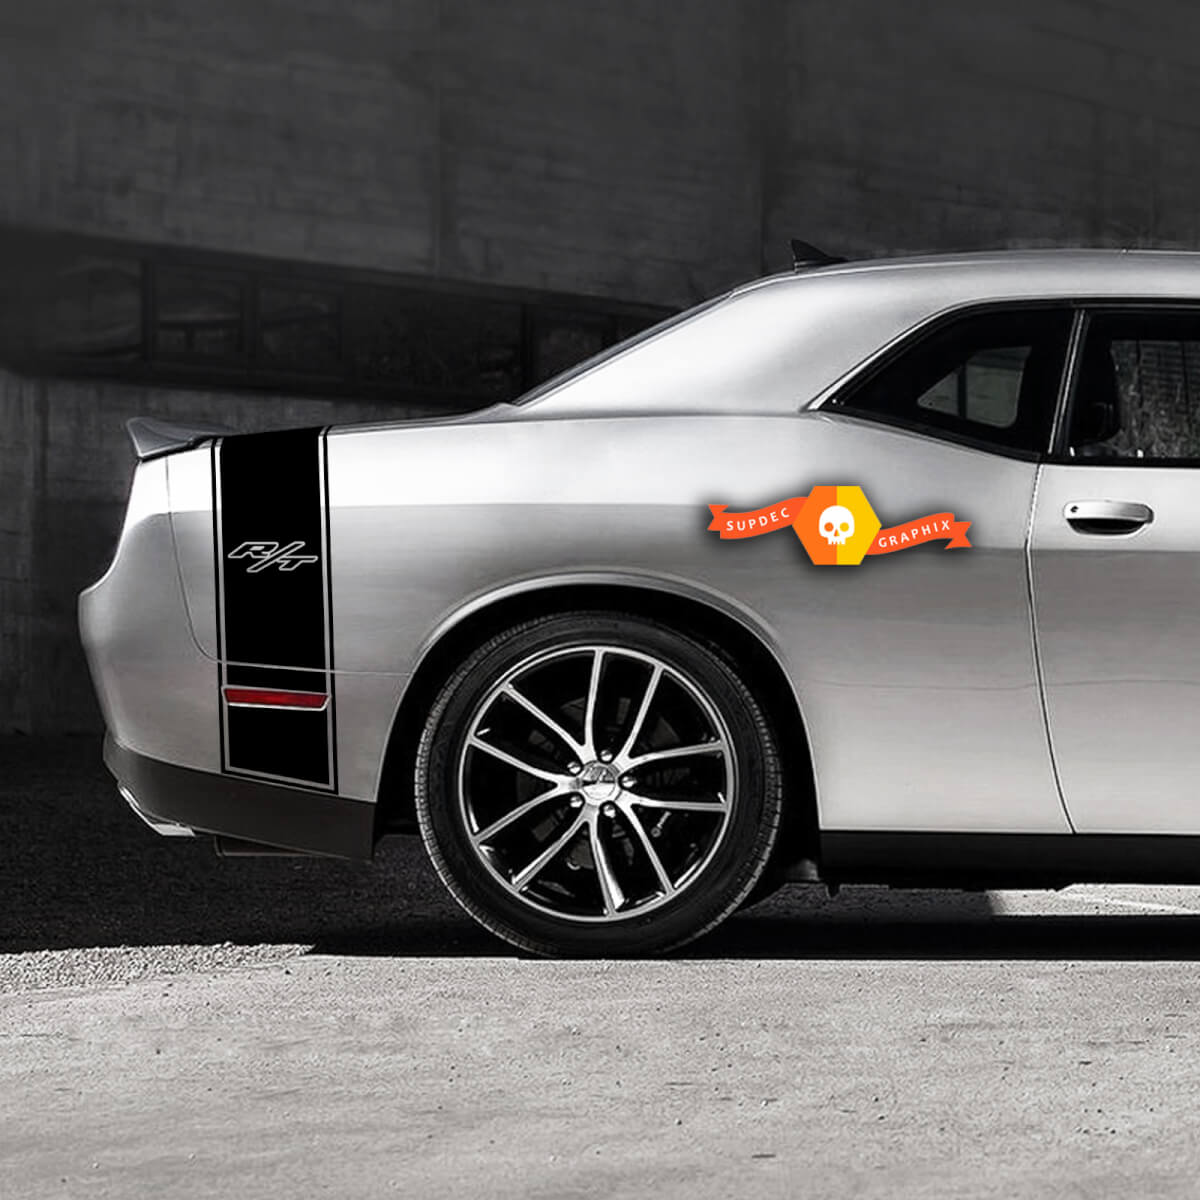 Dodge Challenger Schwanzband R / T Aufkleber Aufkleber Grafiken passt zu Modellen